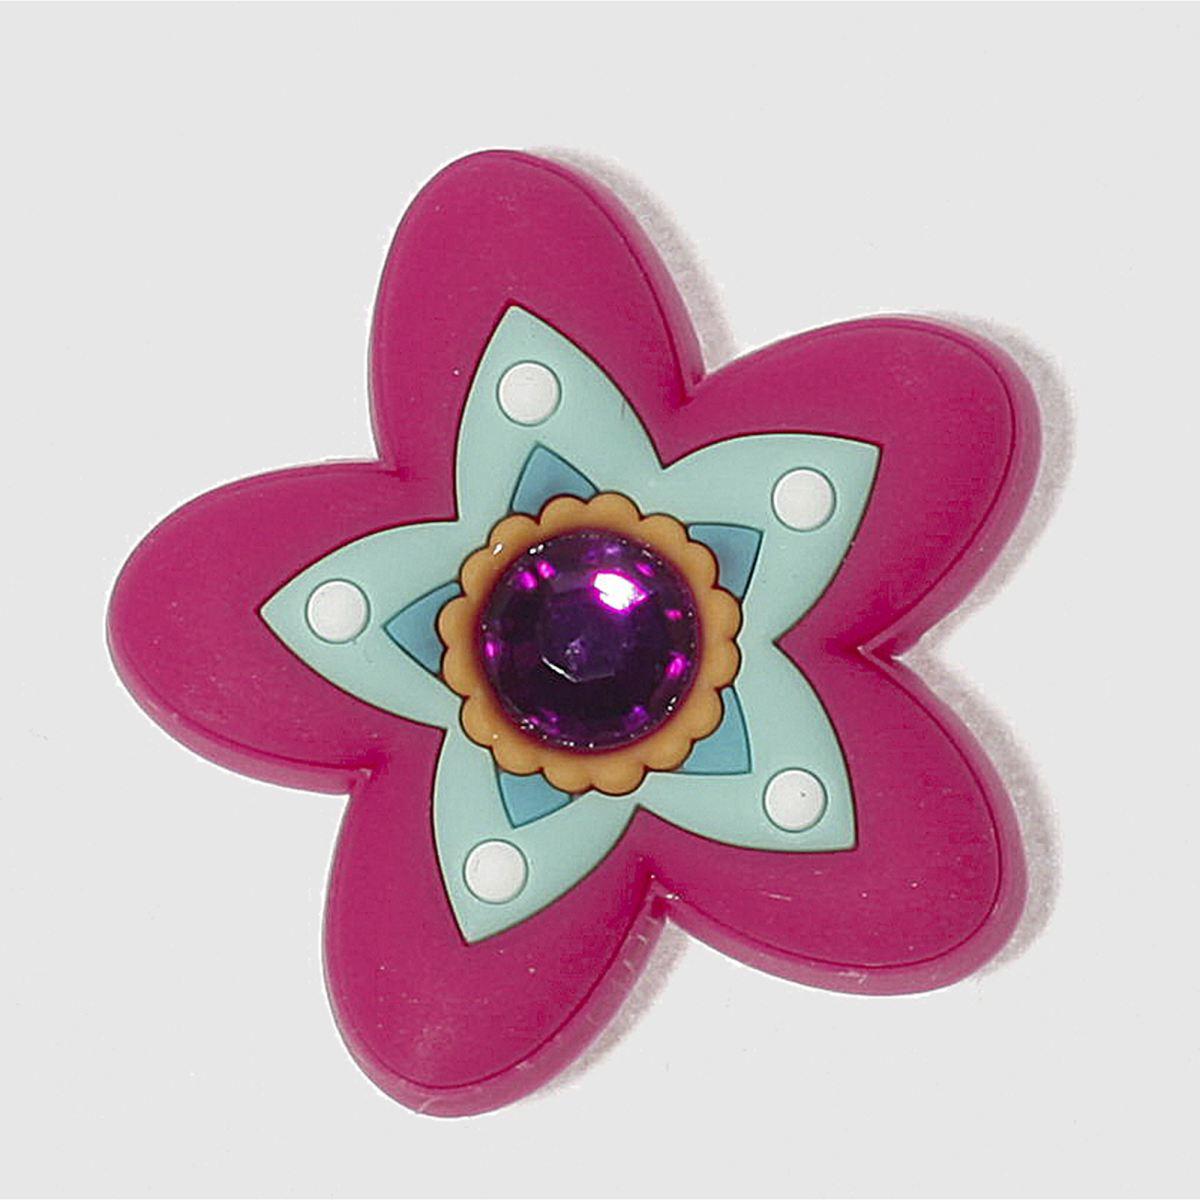 jibbitz Jibbitz Pink Rhinestone Flower